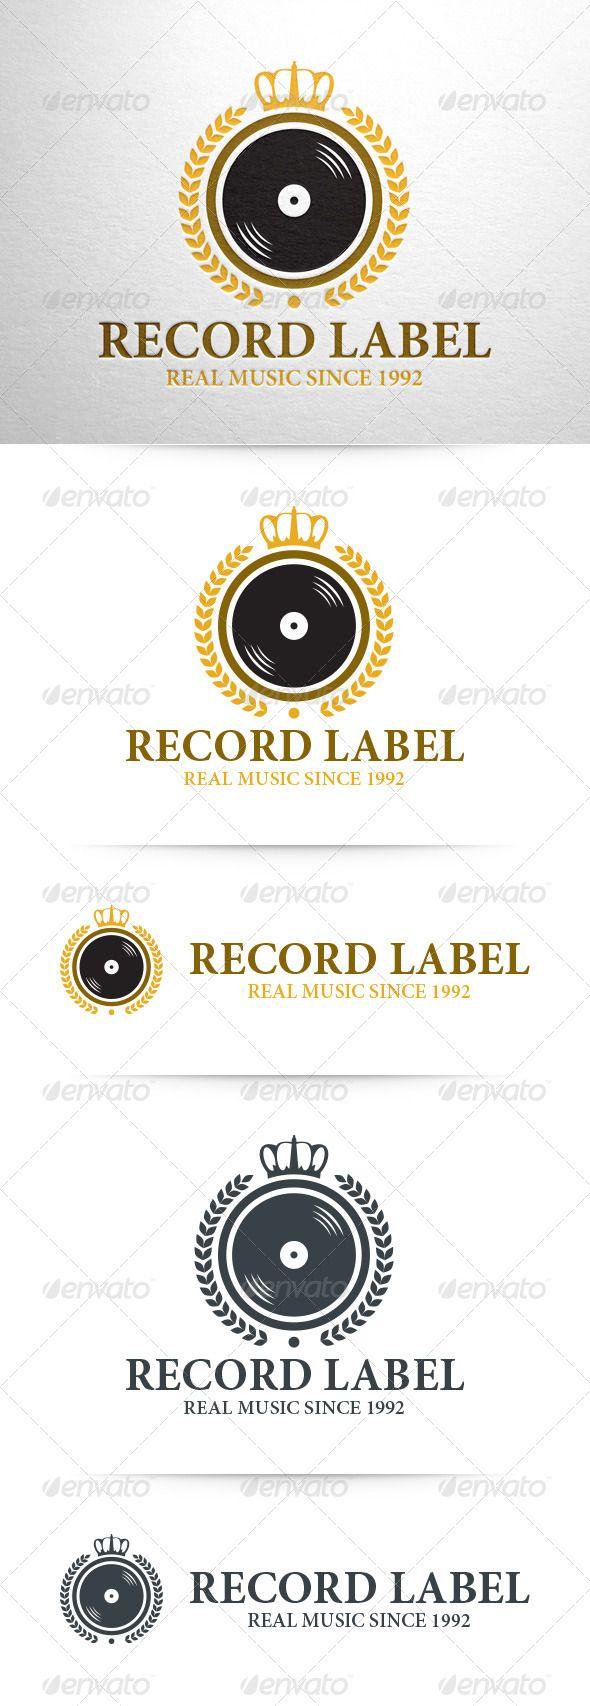 Record Label Logo Template Logos, Logo templates and